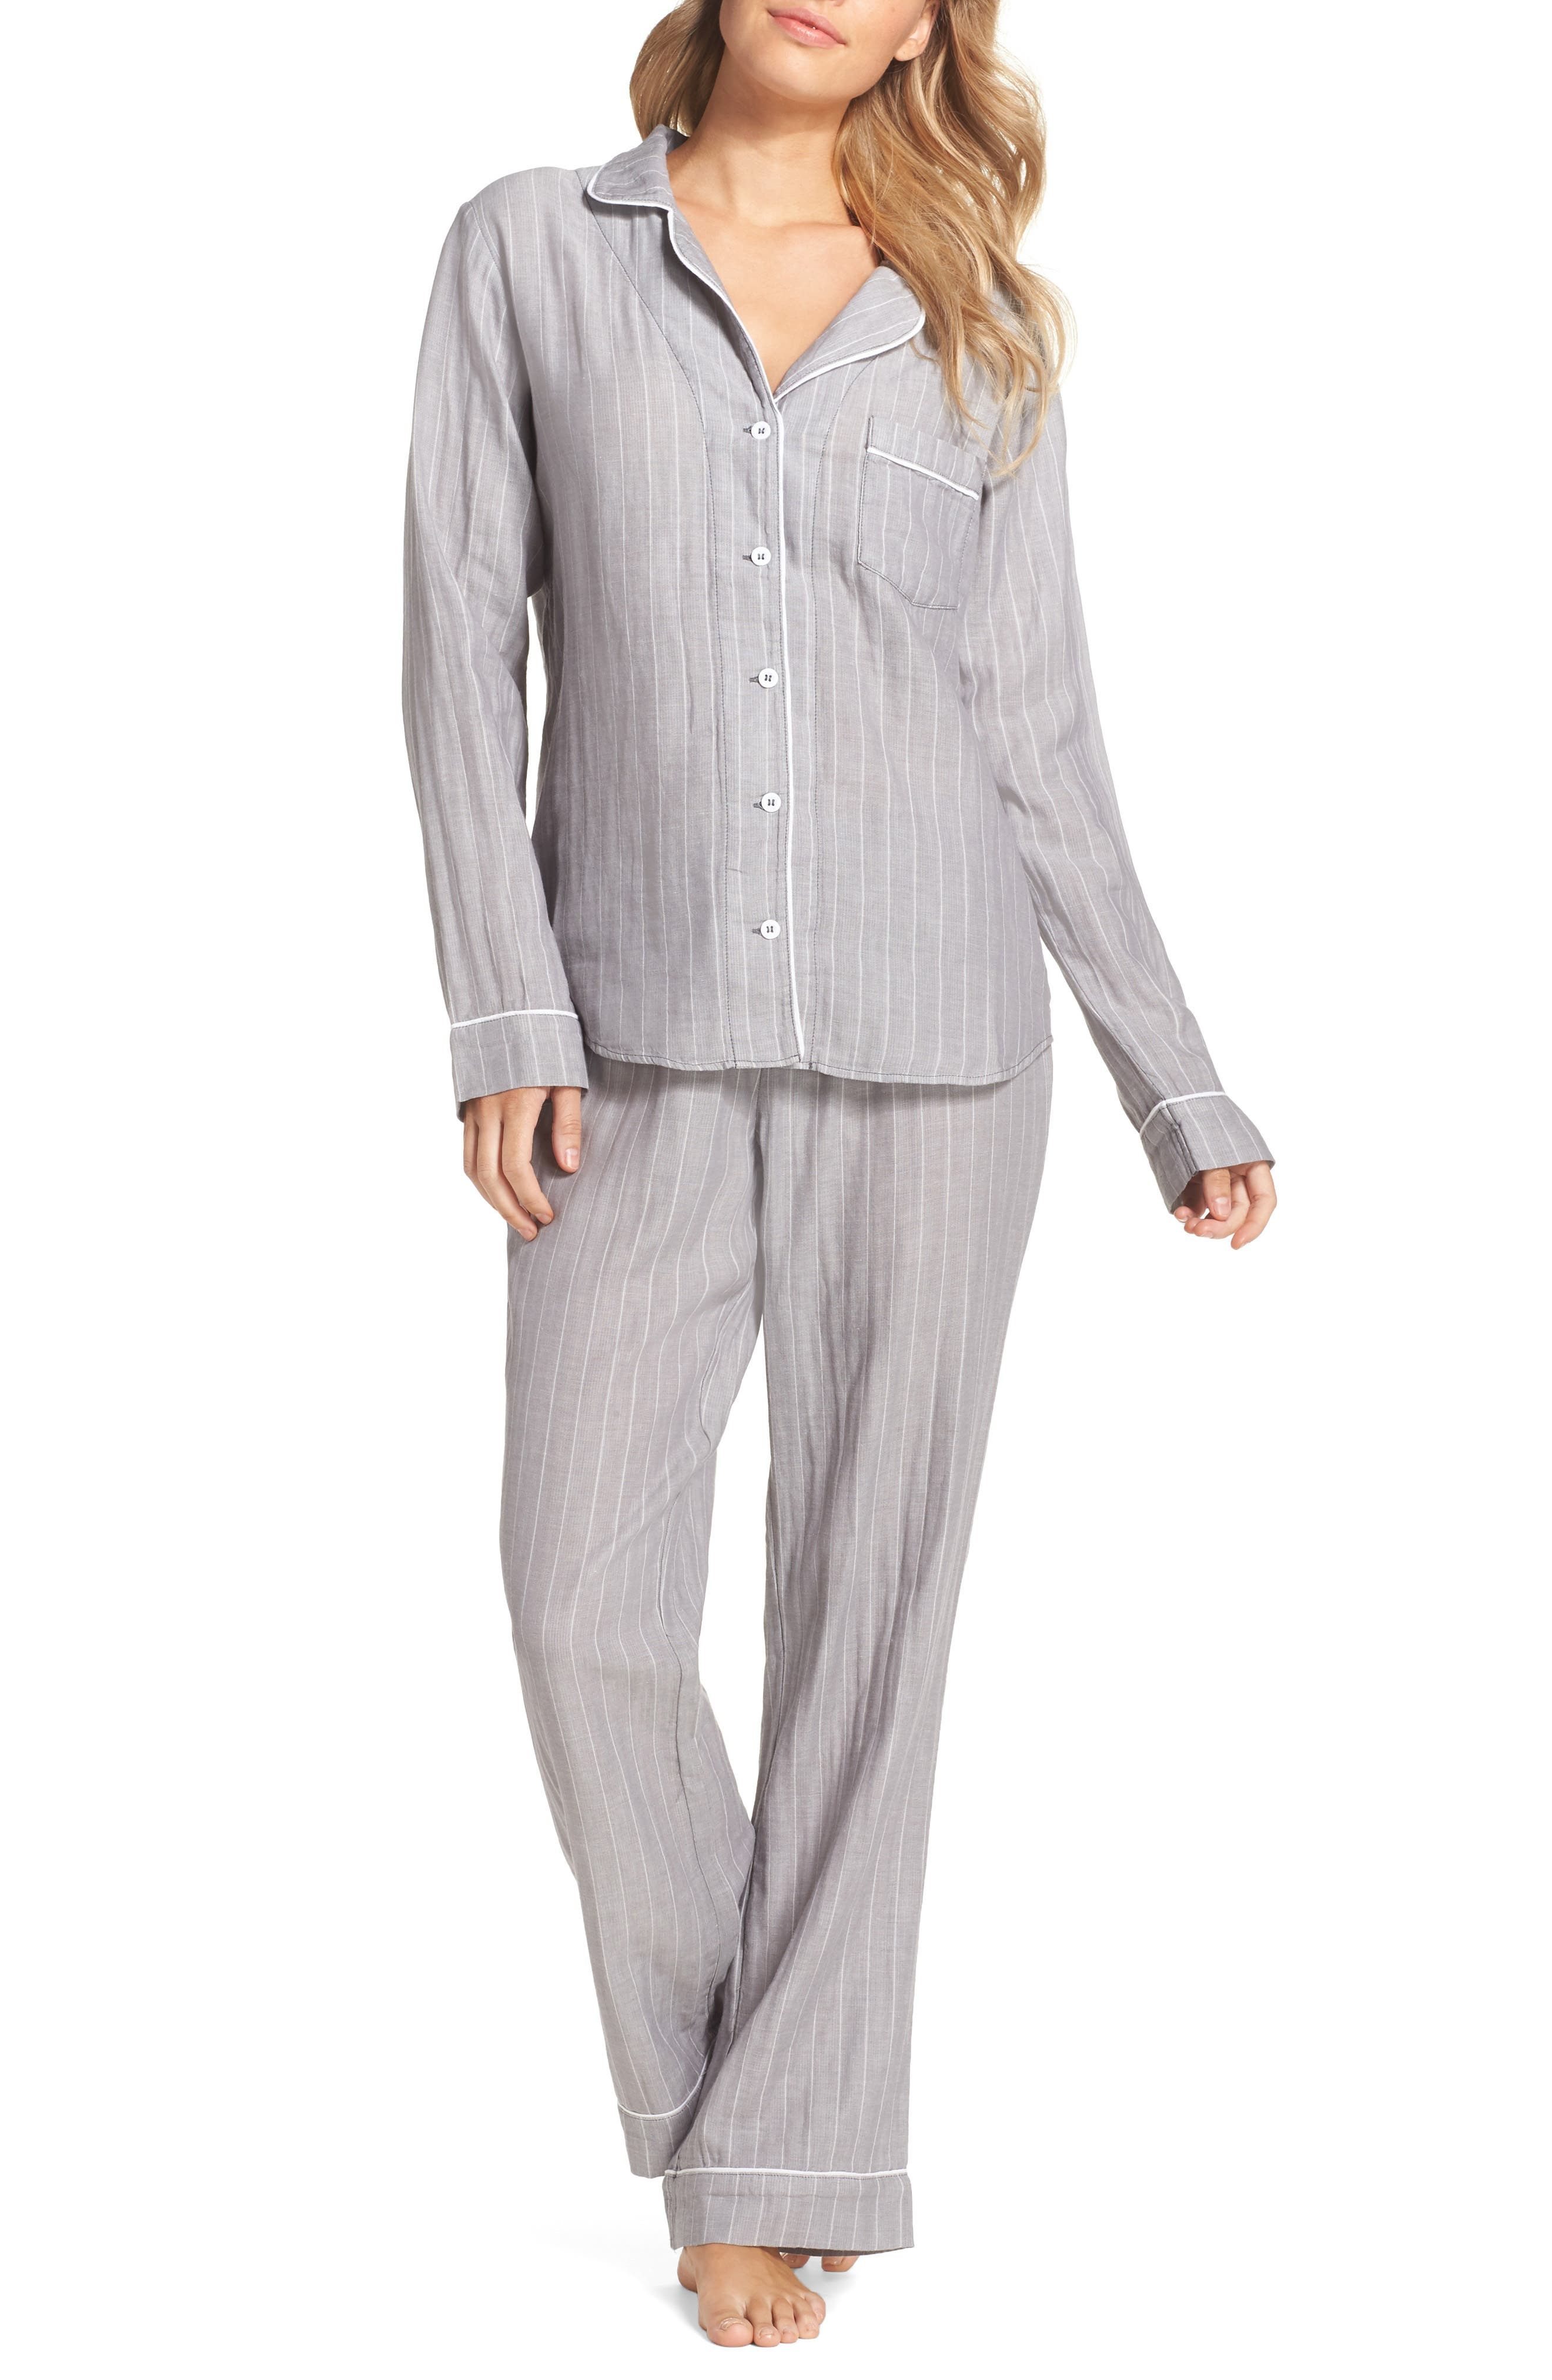 Raven Stripe Pajamas,                             Main thumbnail 1, color,                             020